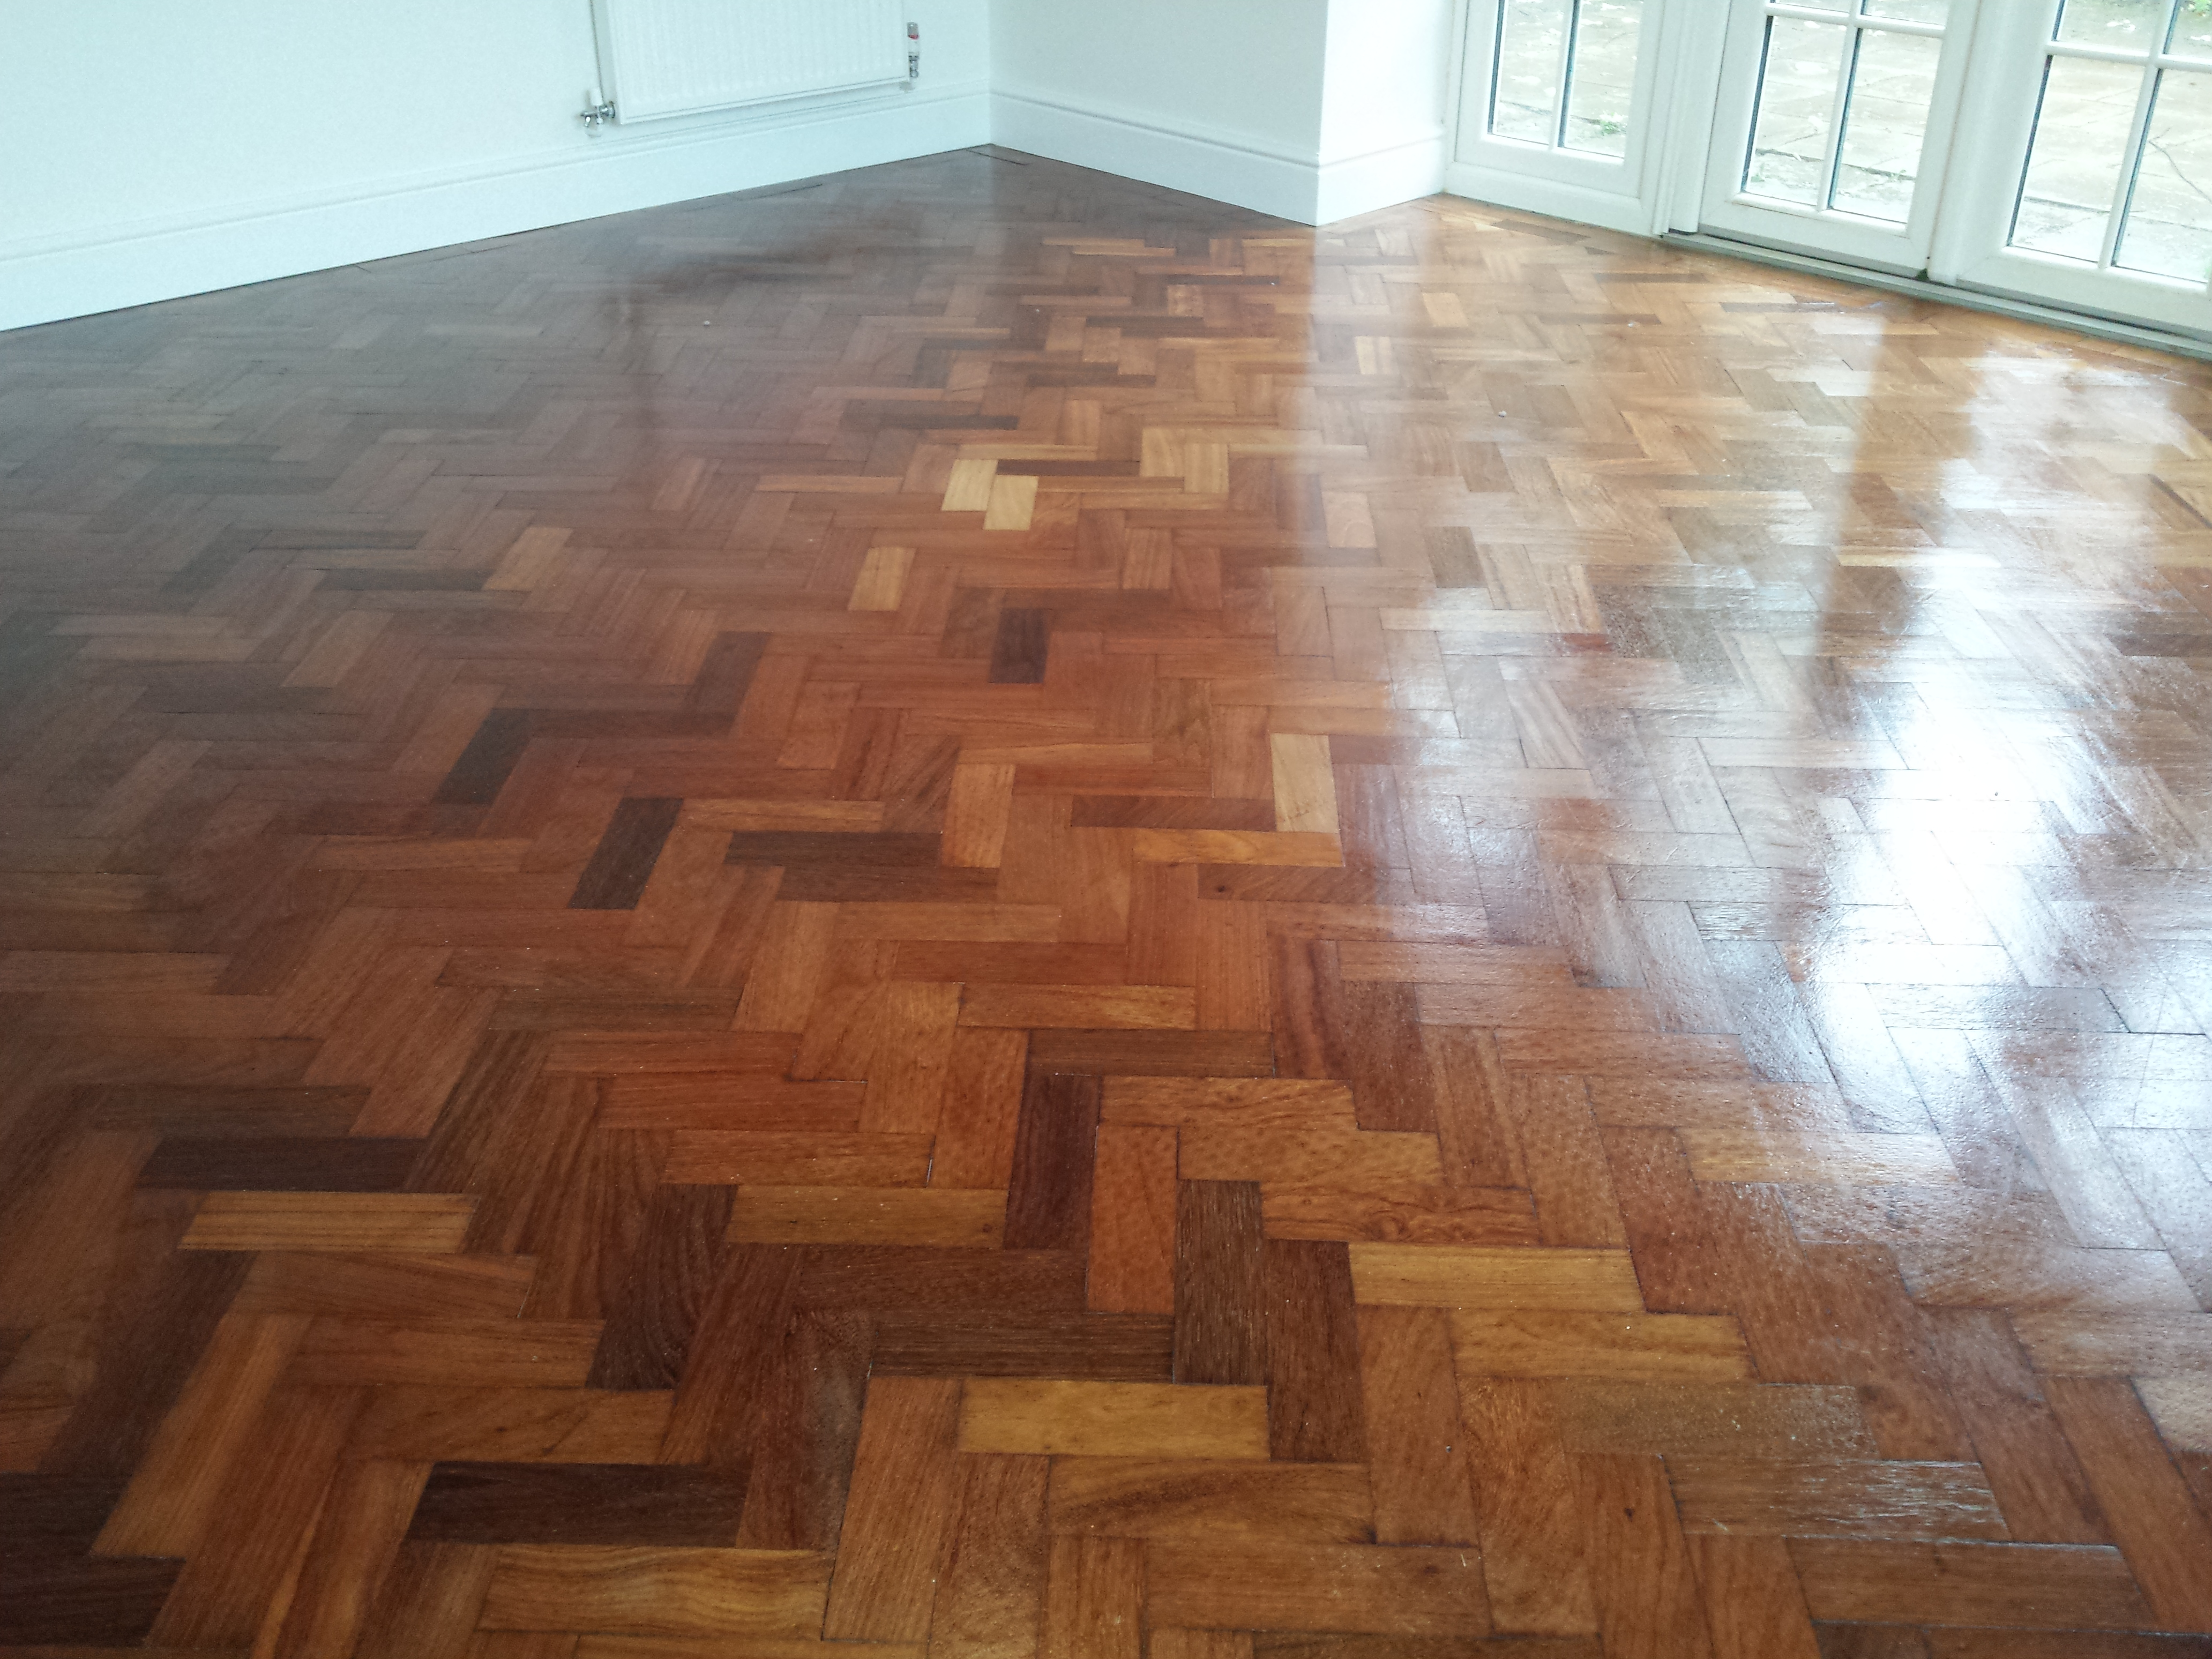 ... Wood Floor Restoration Banbury From Floorrestoreoxford Co Uk ...